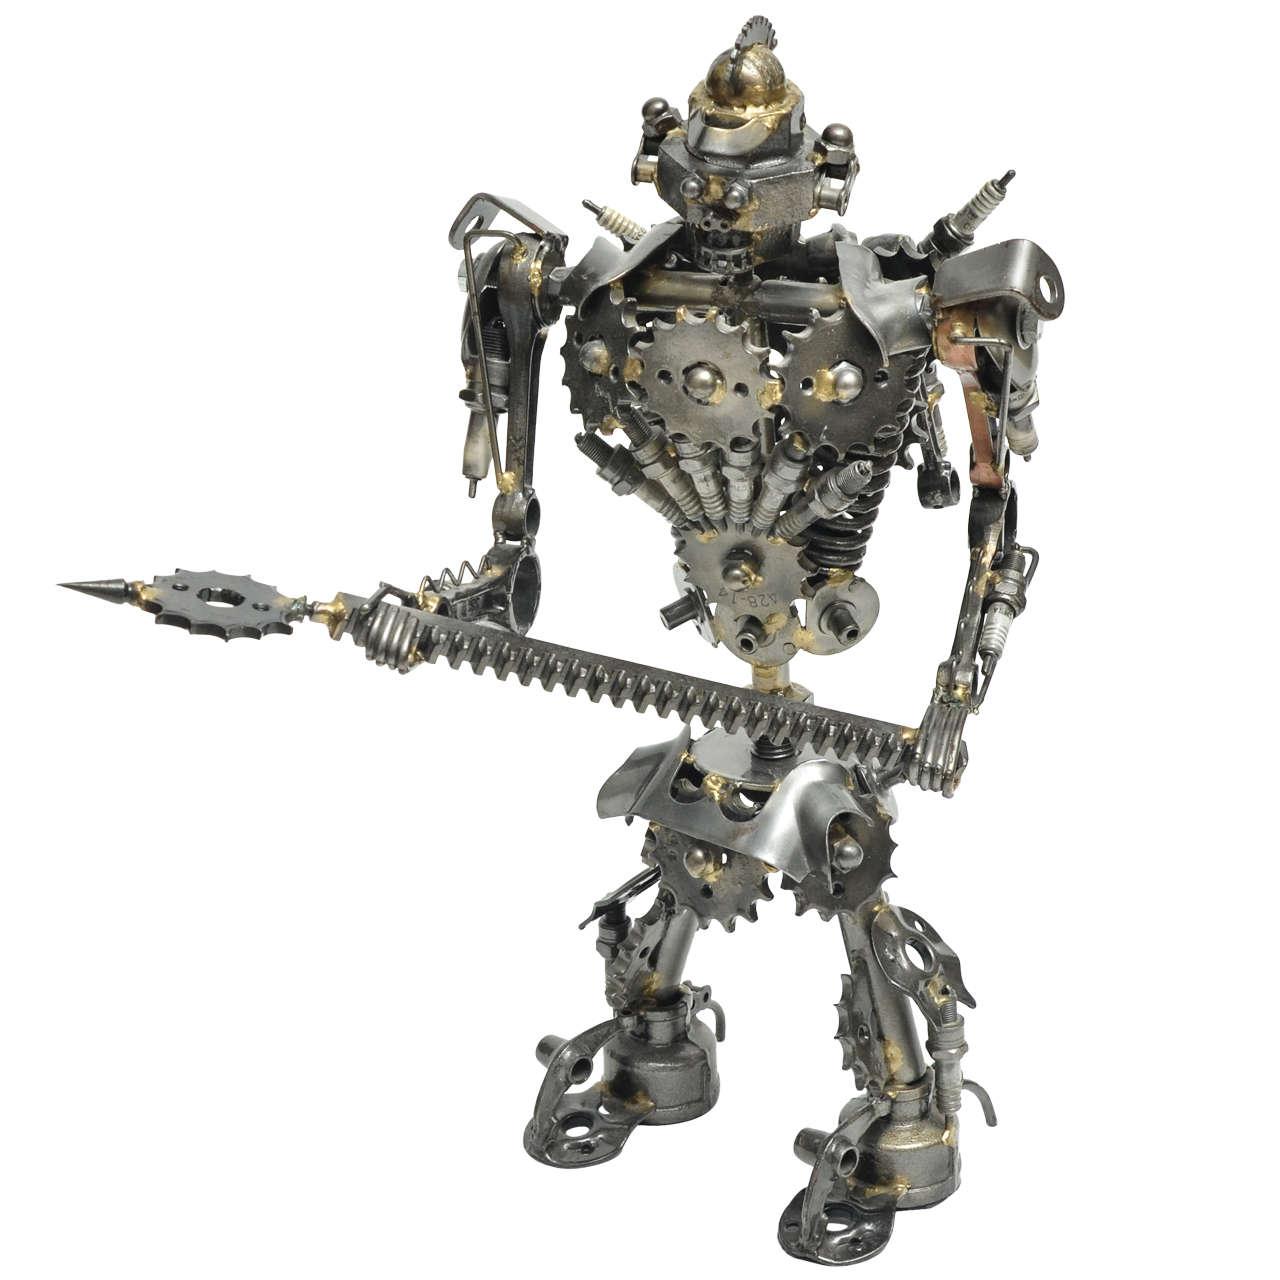 Unusual Articulated Robot Warrior Sculpture Composed of Misc  Scrap Parts